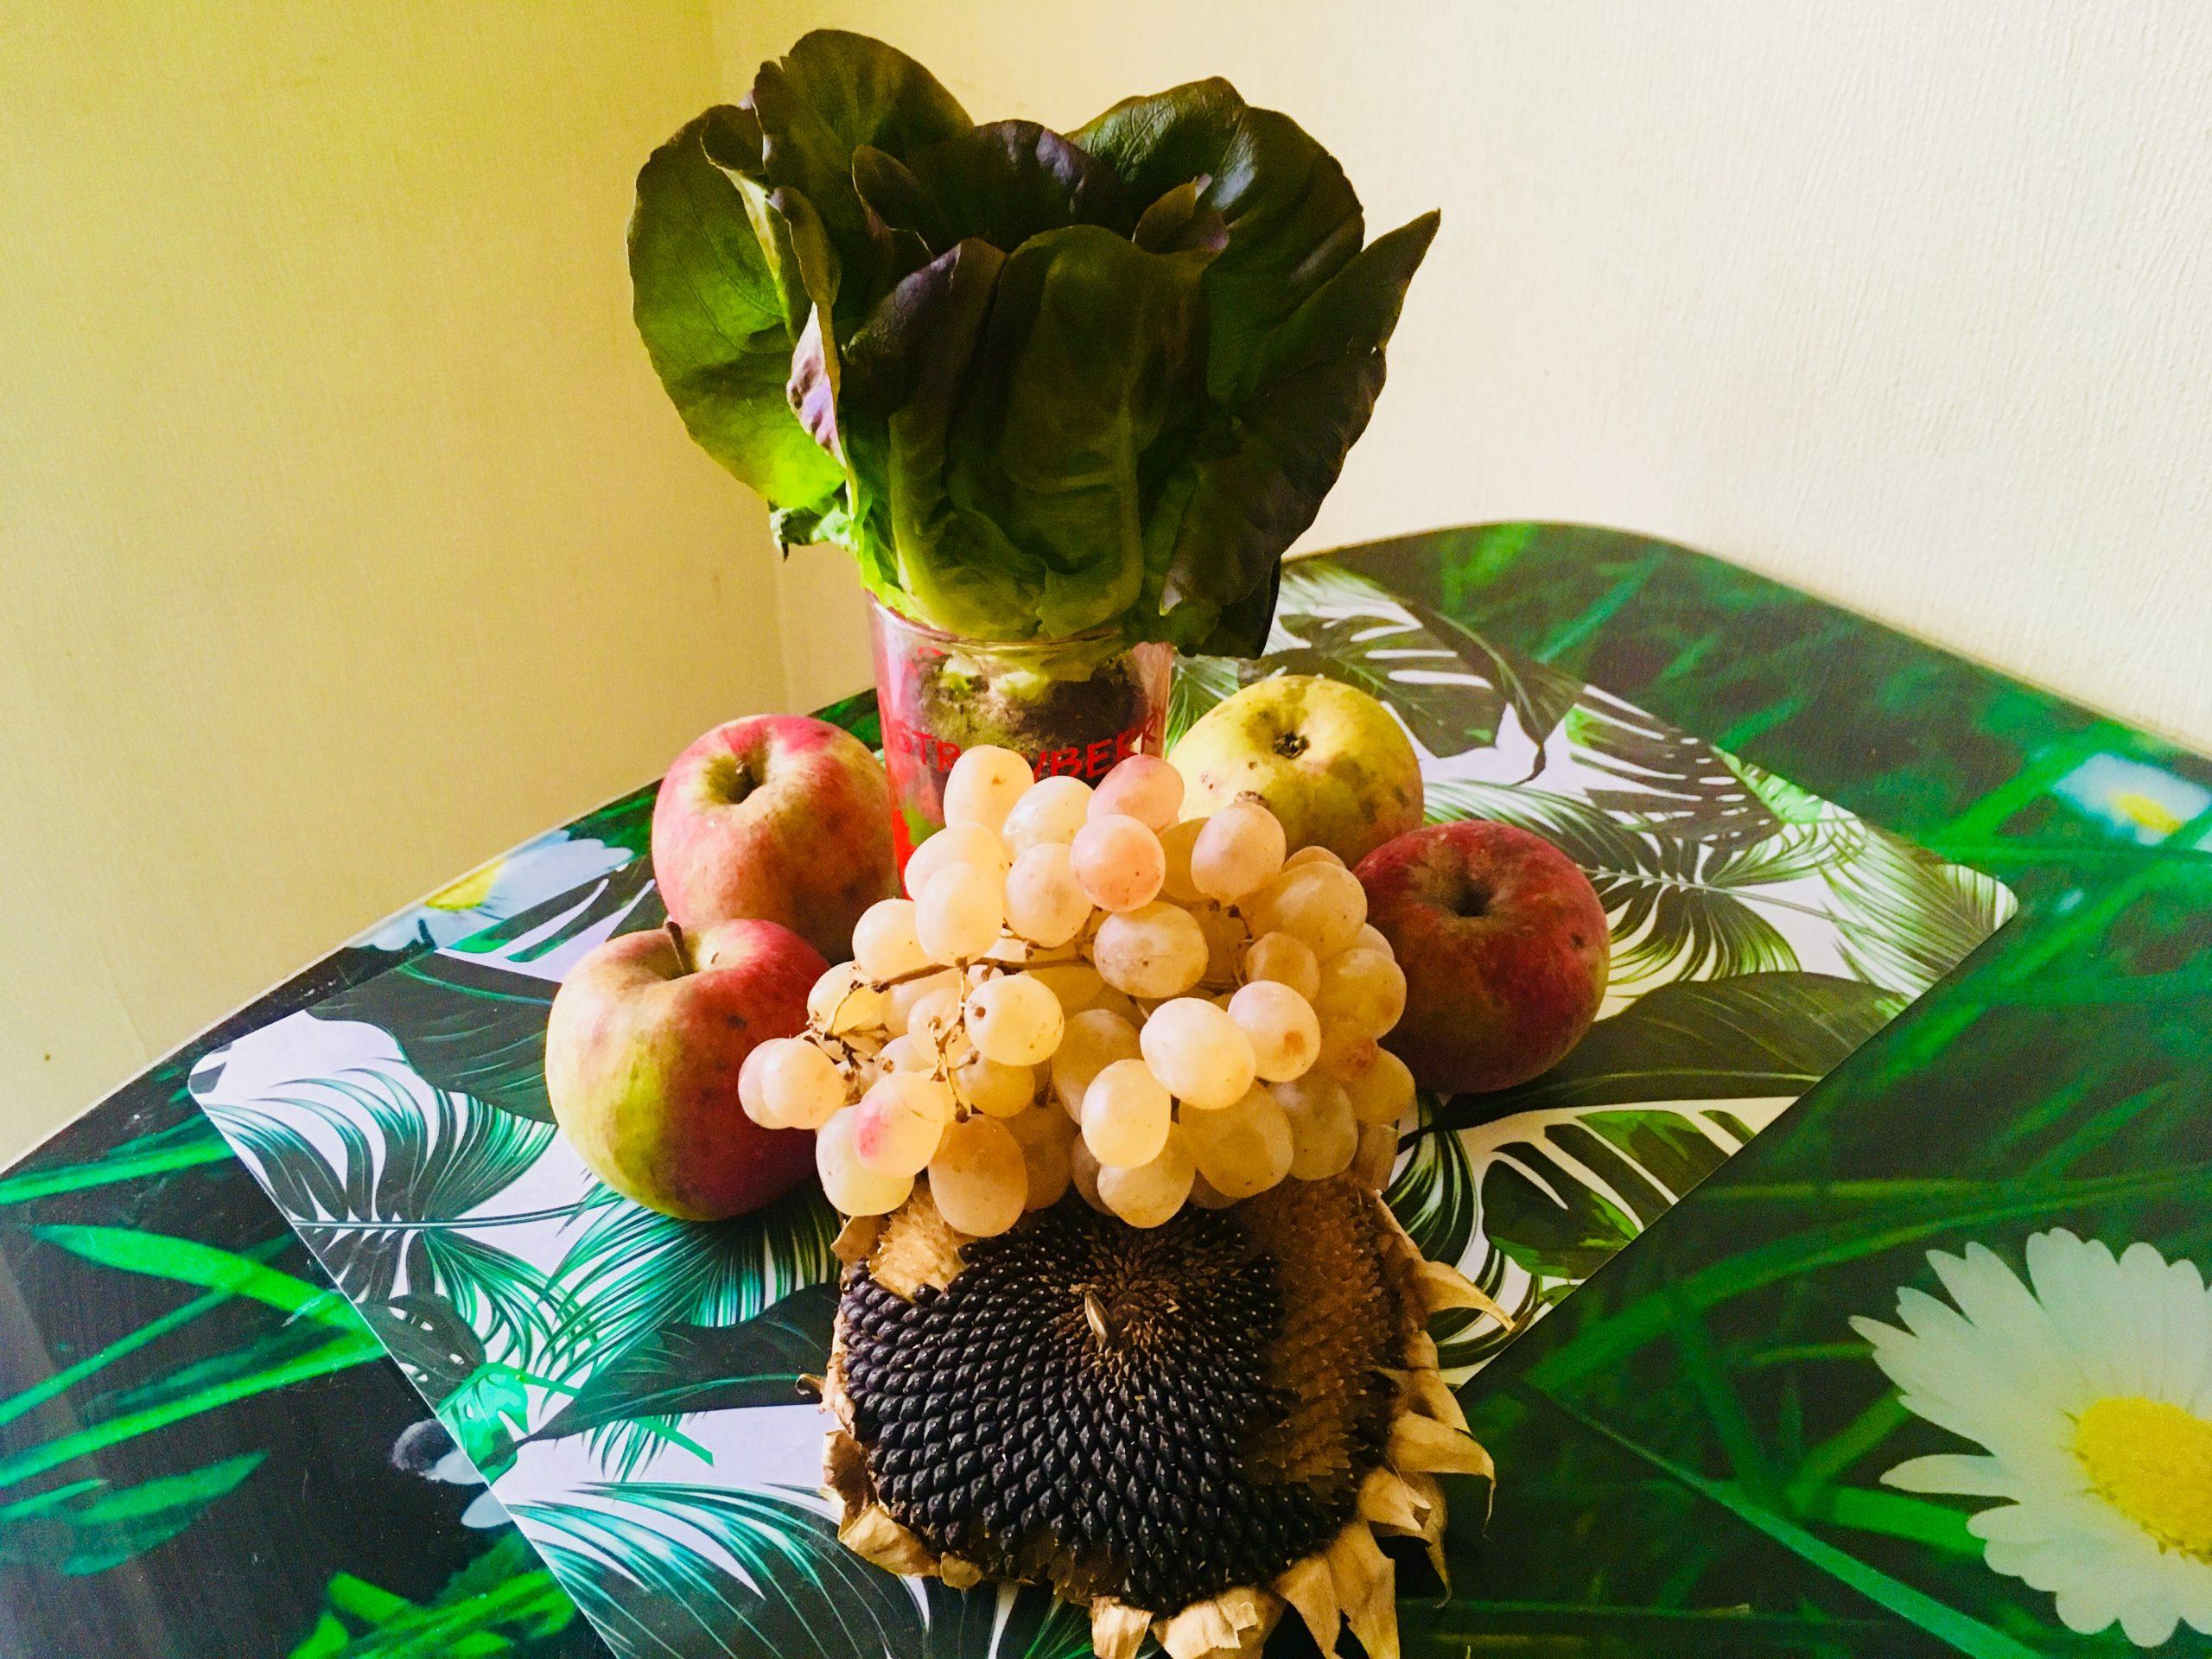 зелень, фрукты